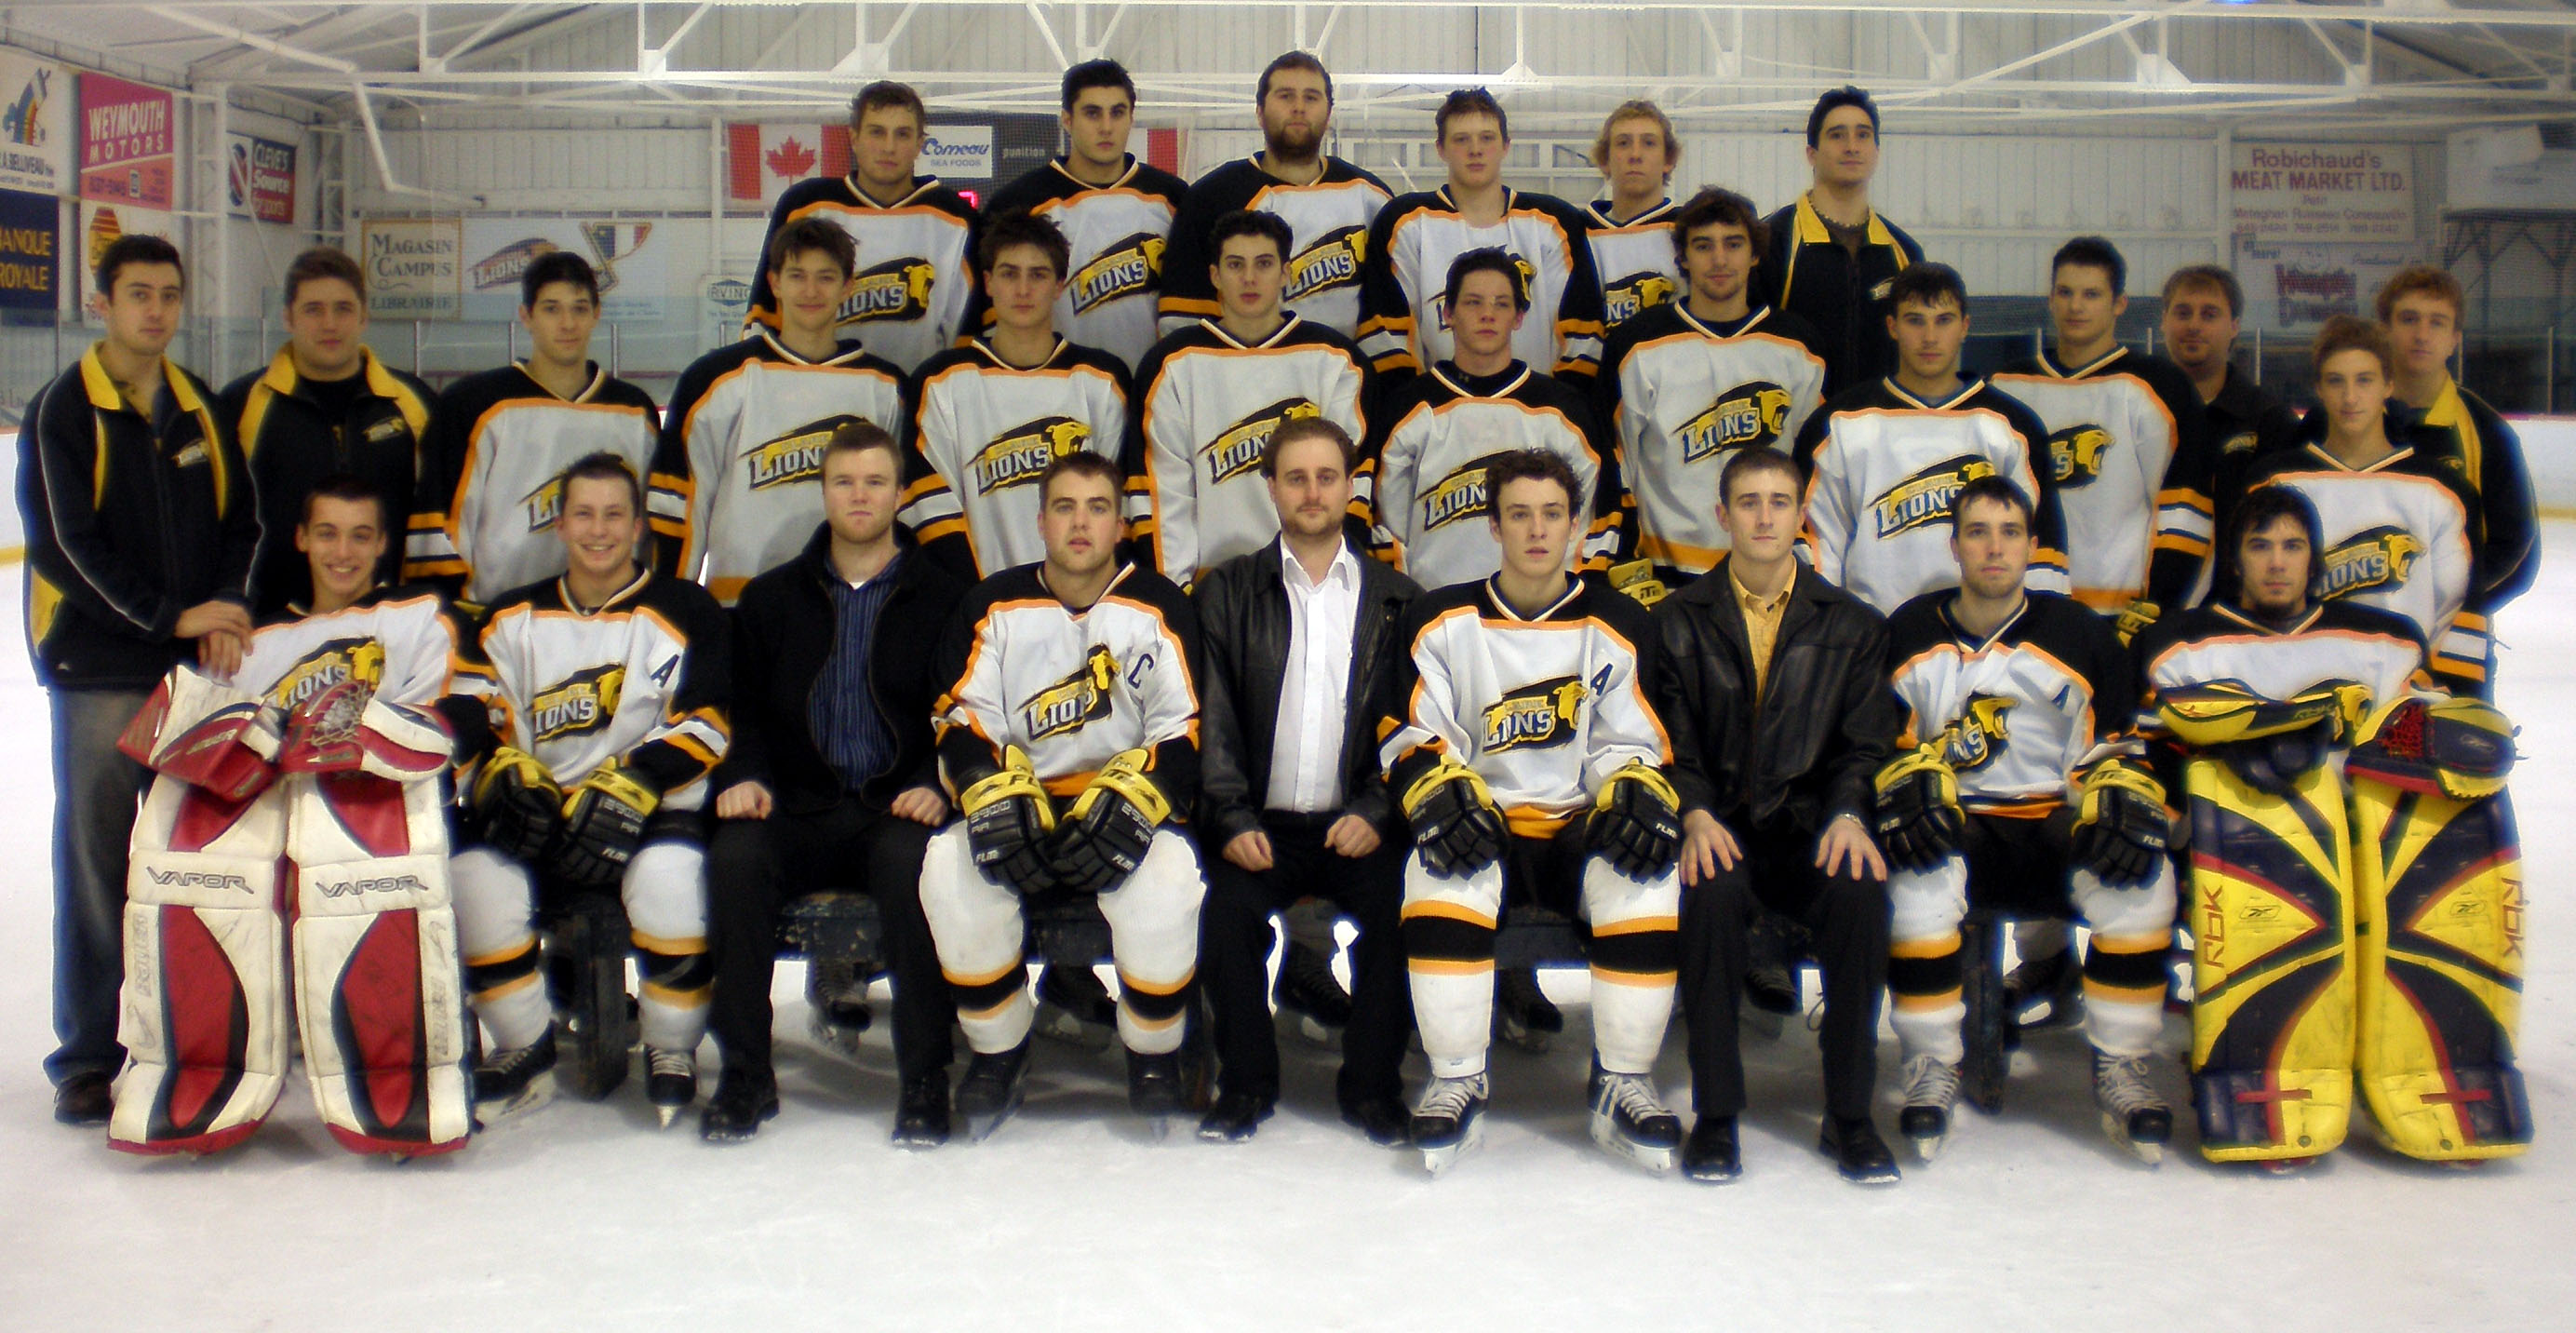 2007-08 NSJCHL Season